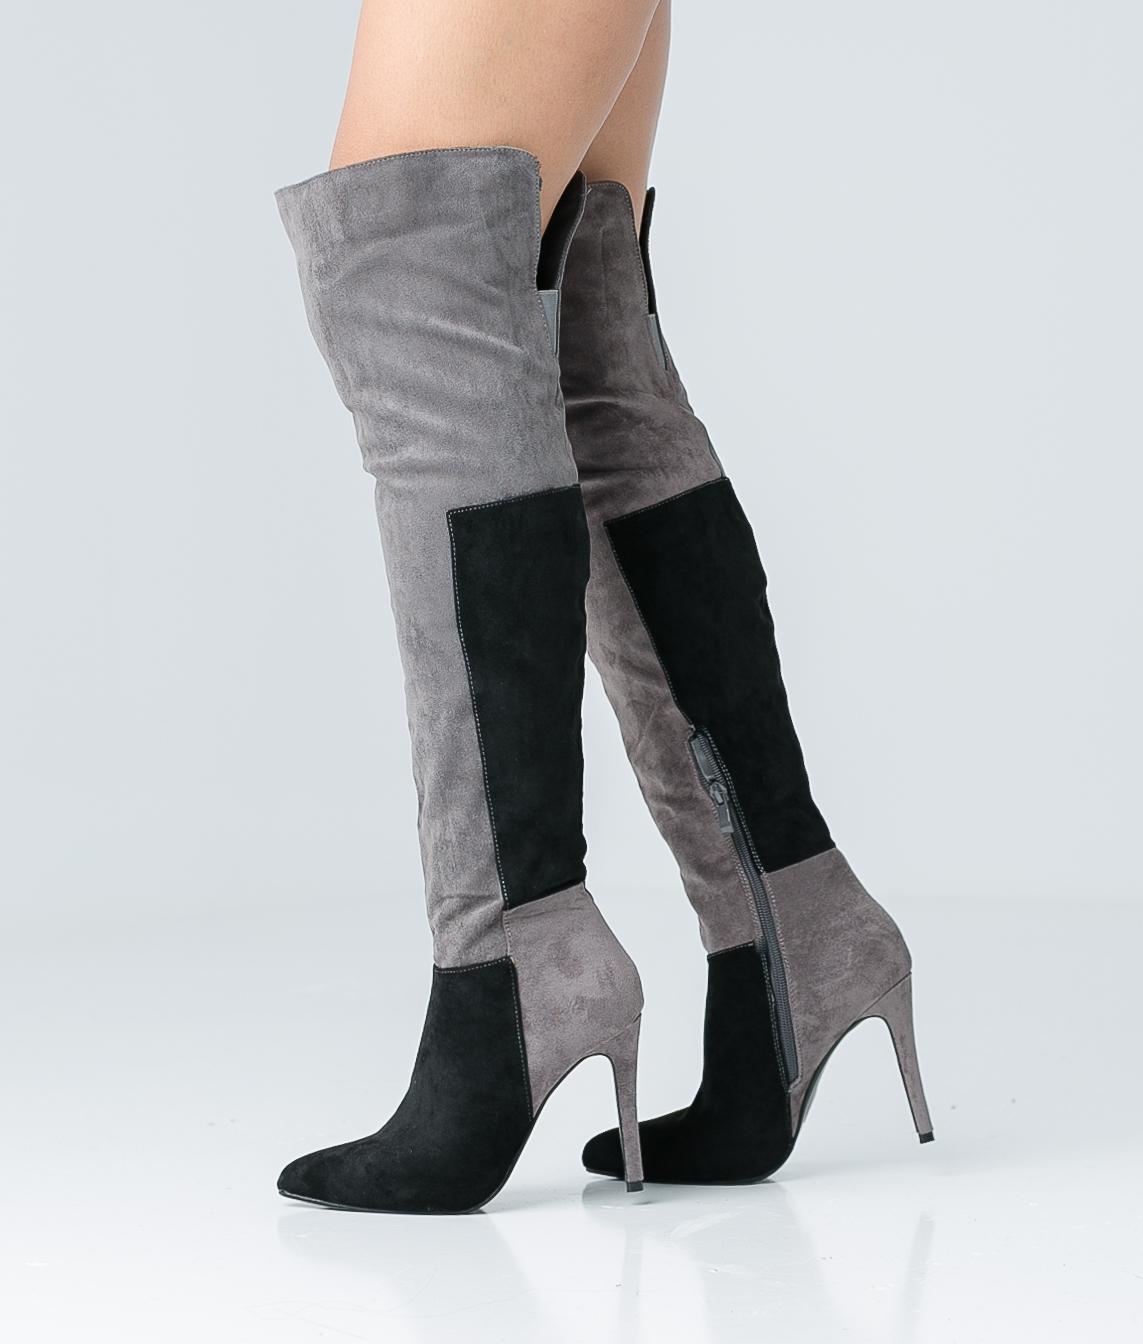 Knee-Length Boot Niela - Black/Grey